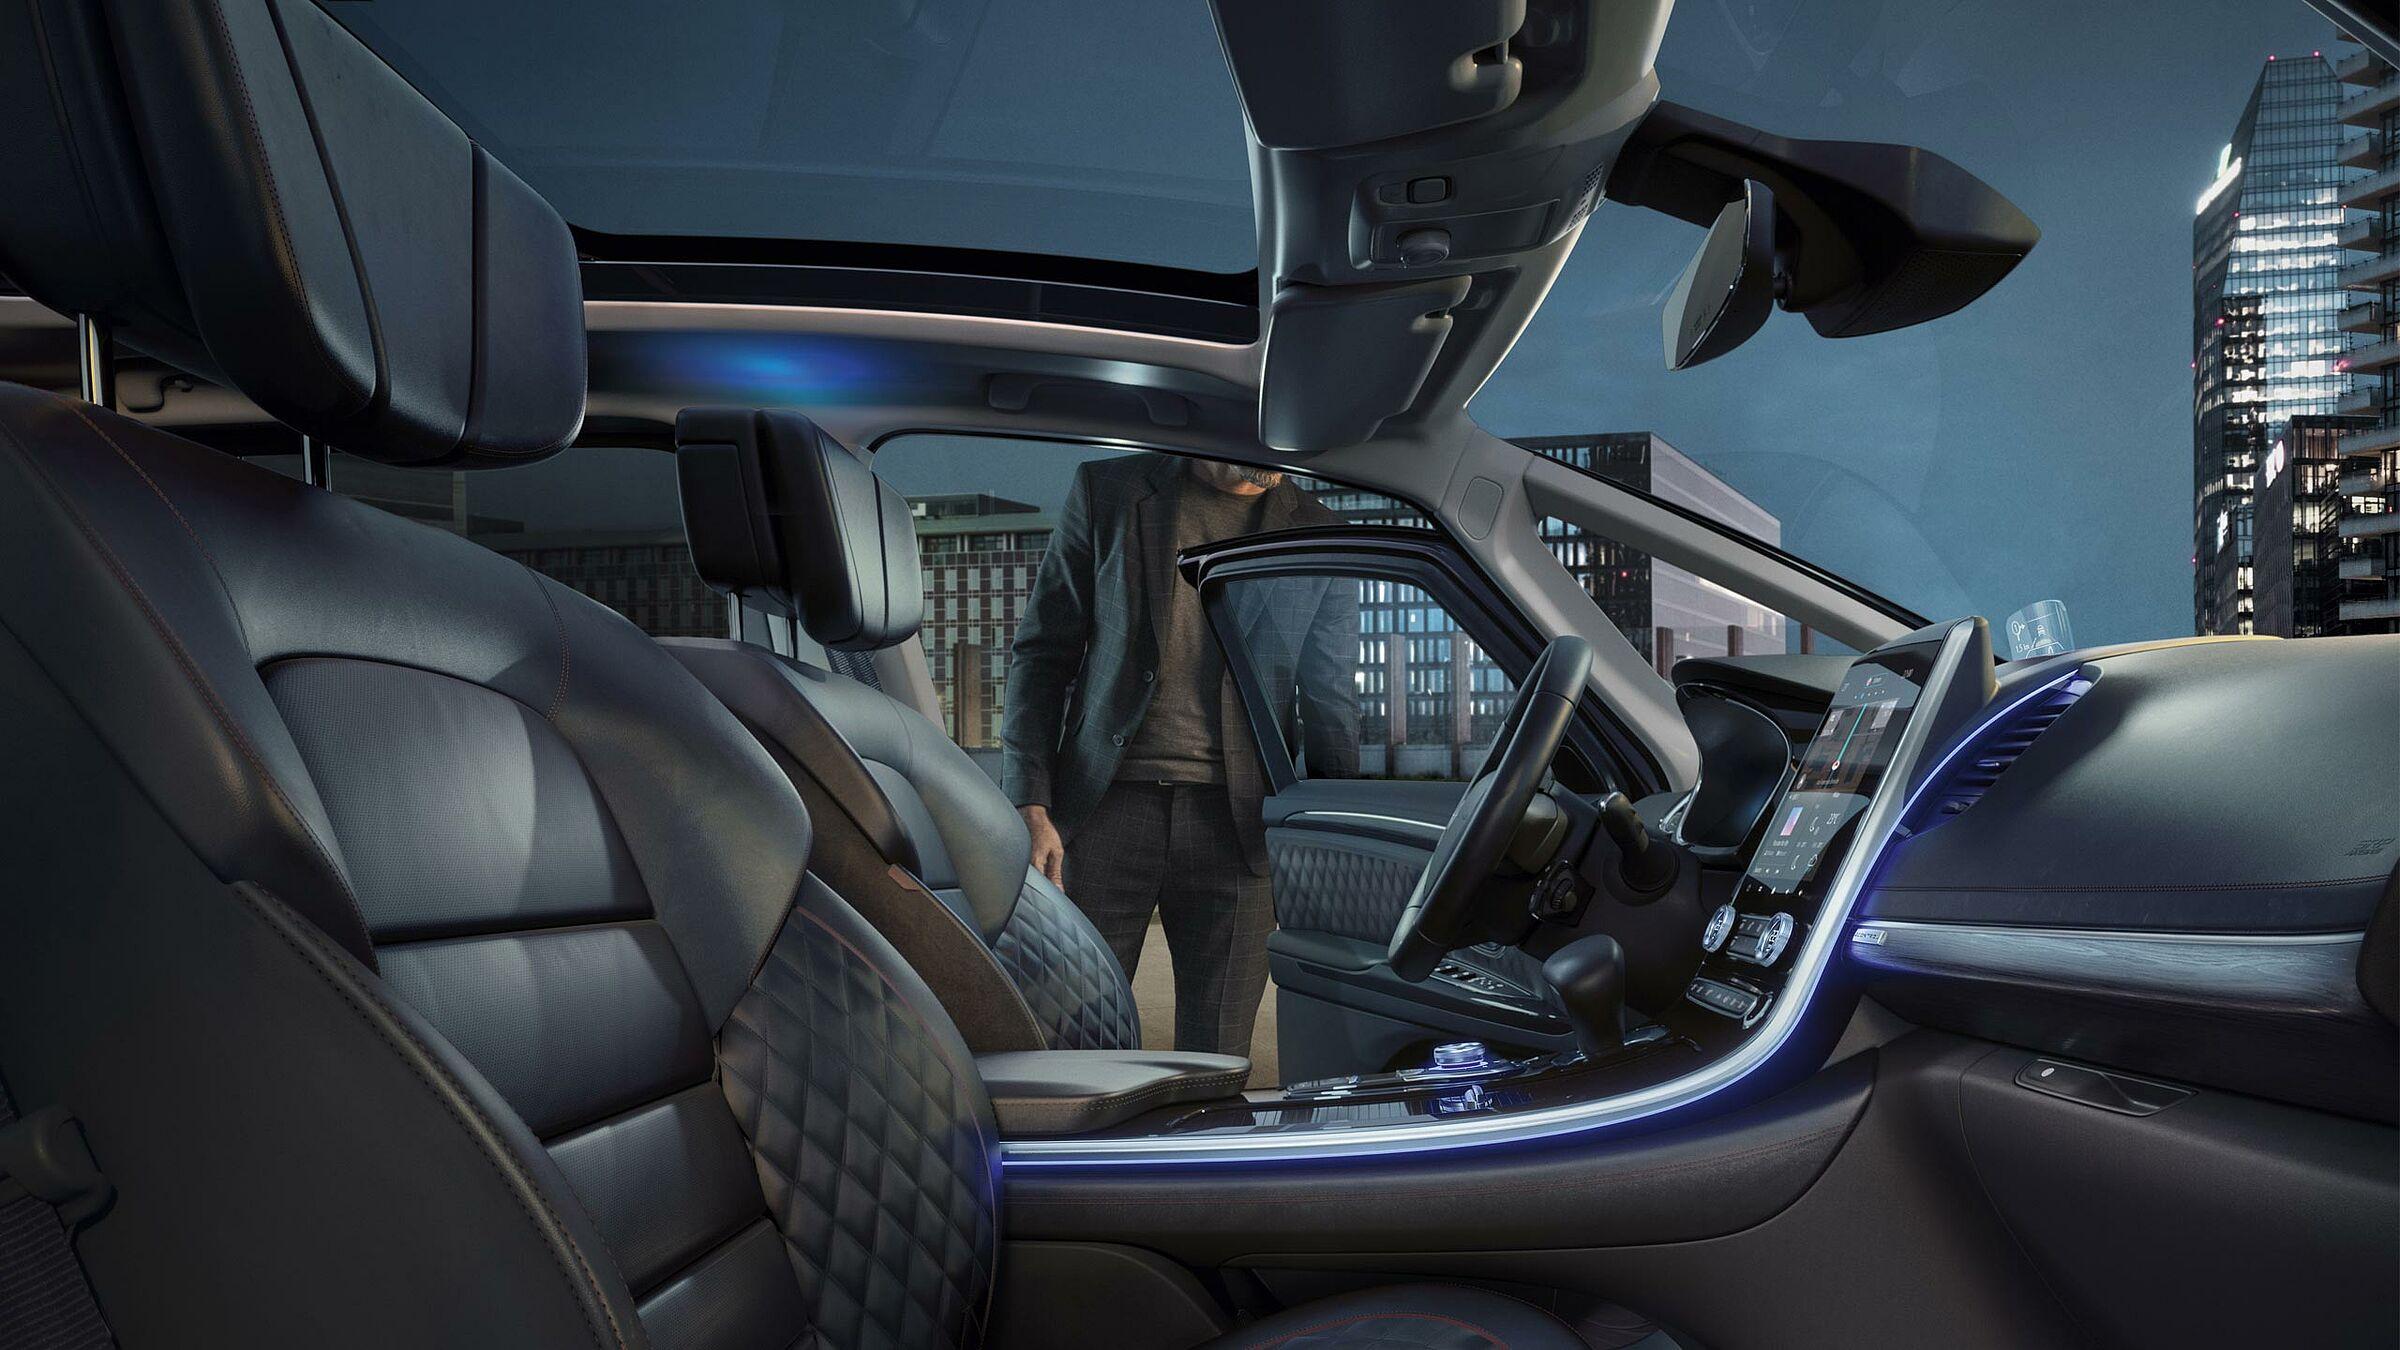 Renault Espace Autozentren P&A - Preckel